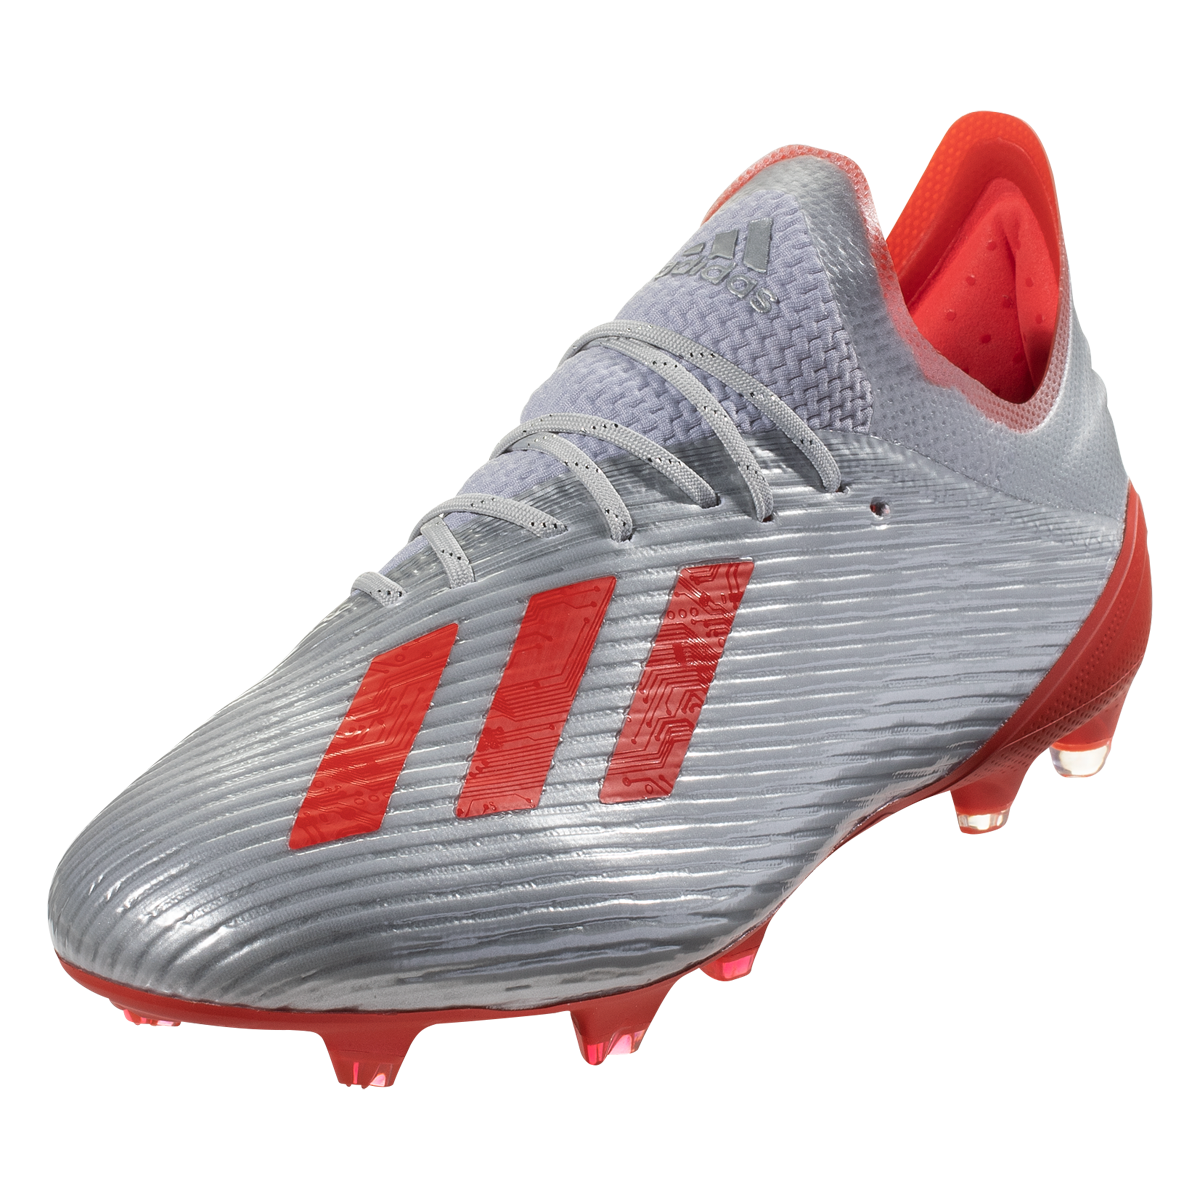 Adidas X 19 1 Fg Soccer Cleats Metallic Silver Hi Res Red White 10 5 Soccer Cleats Metallic Silver Cleats